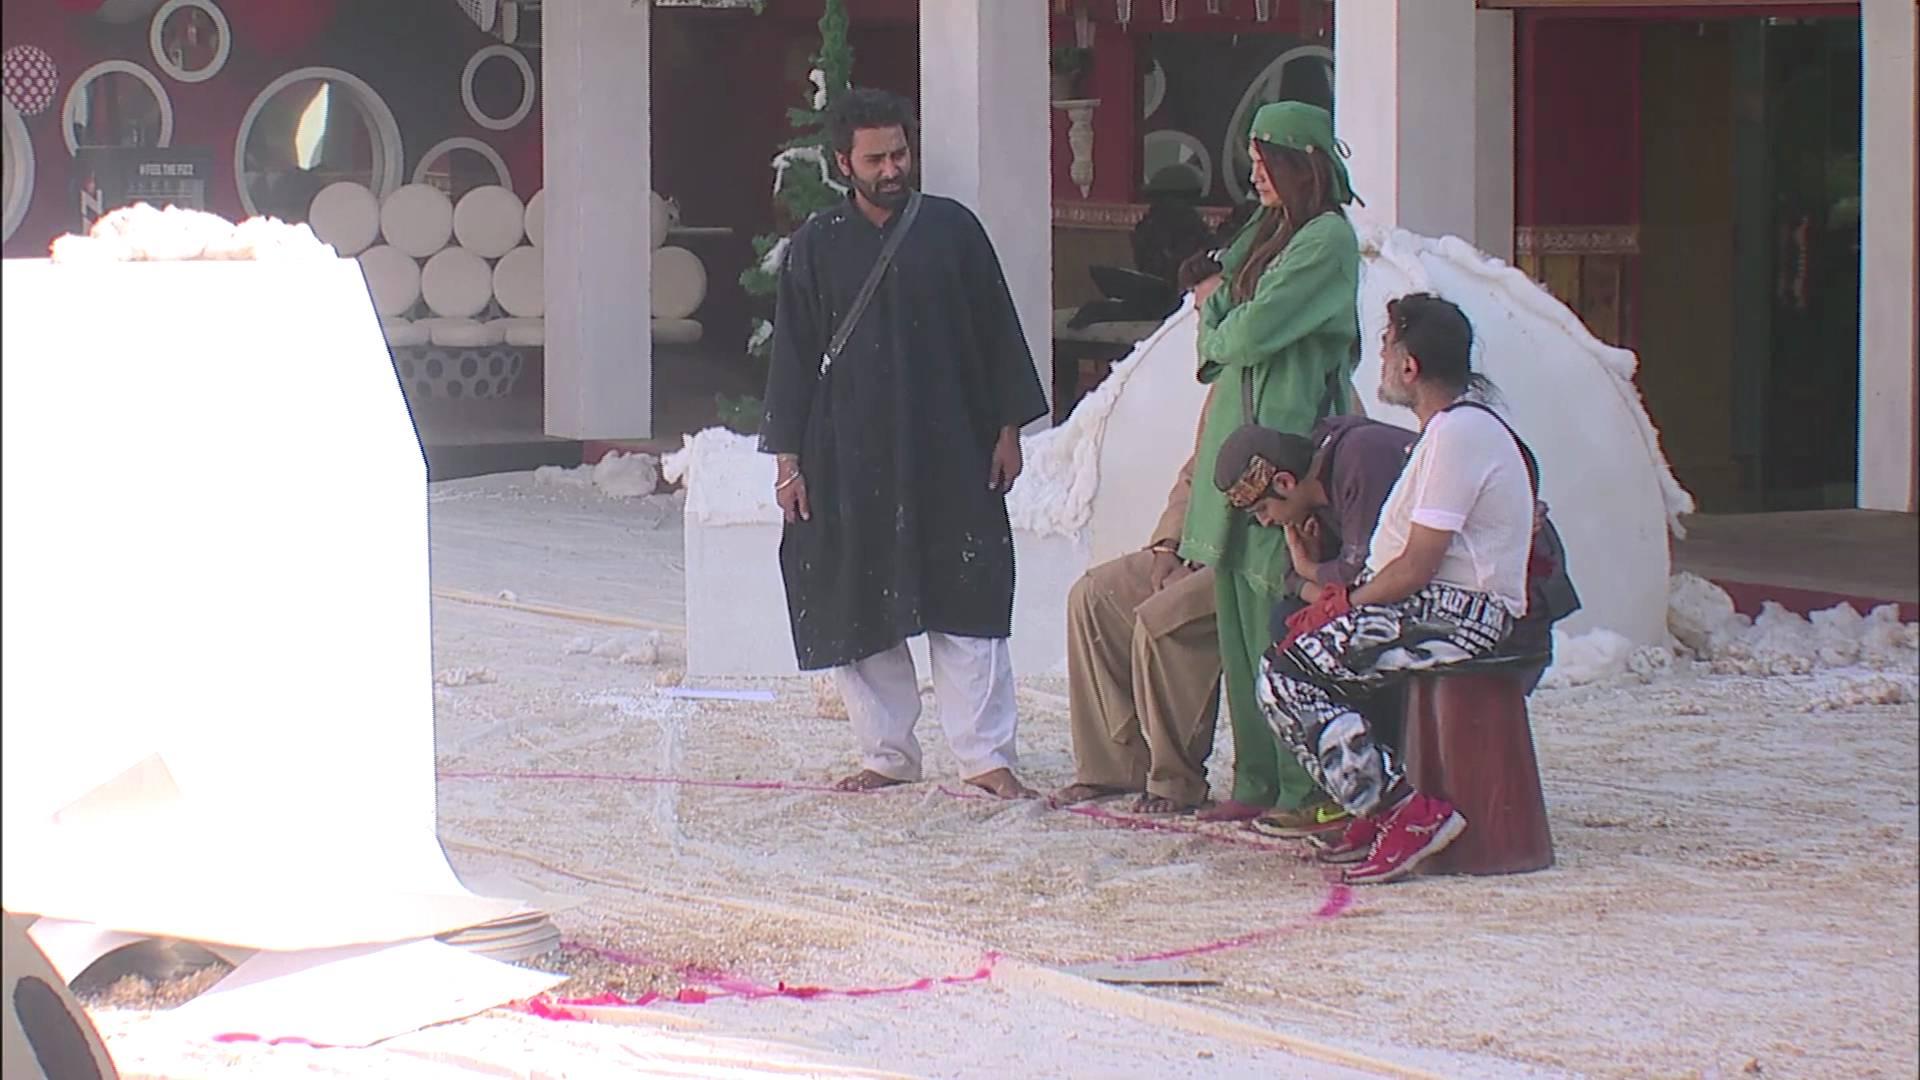 Andekha Action: Rohan get upset by Swami Om and Manveer's behavior!